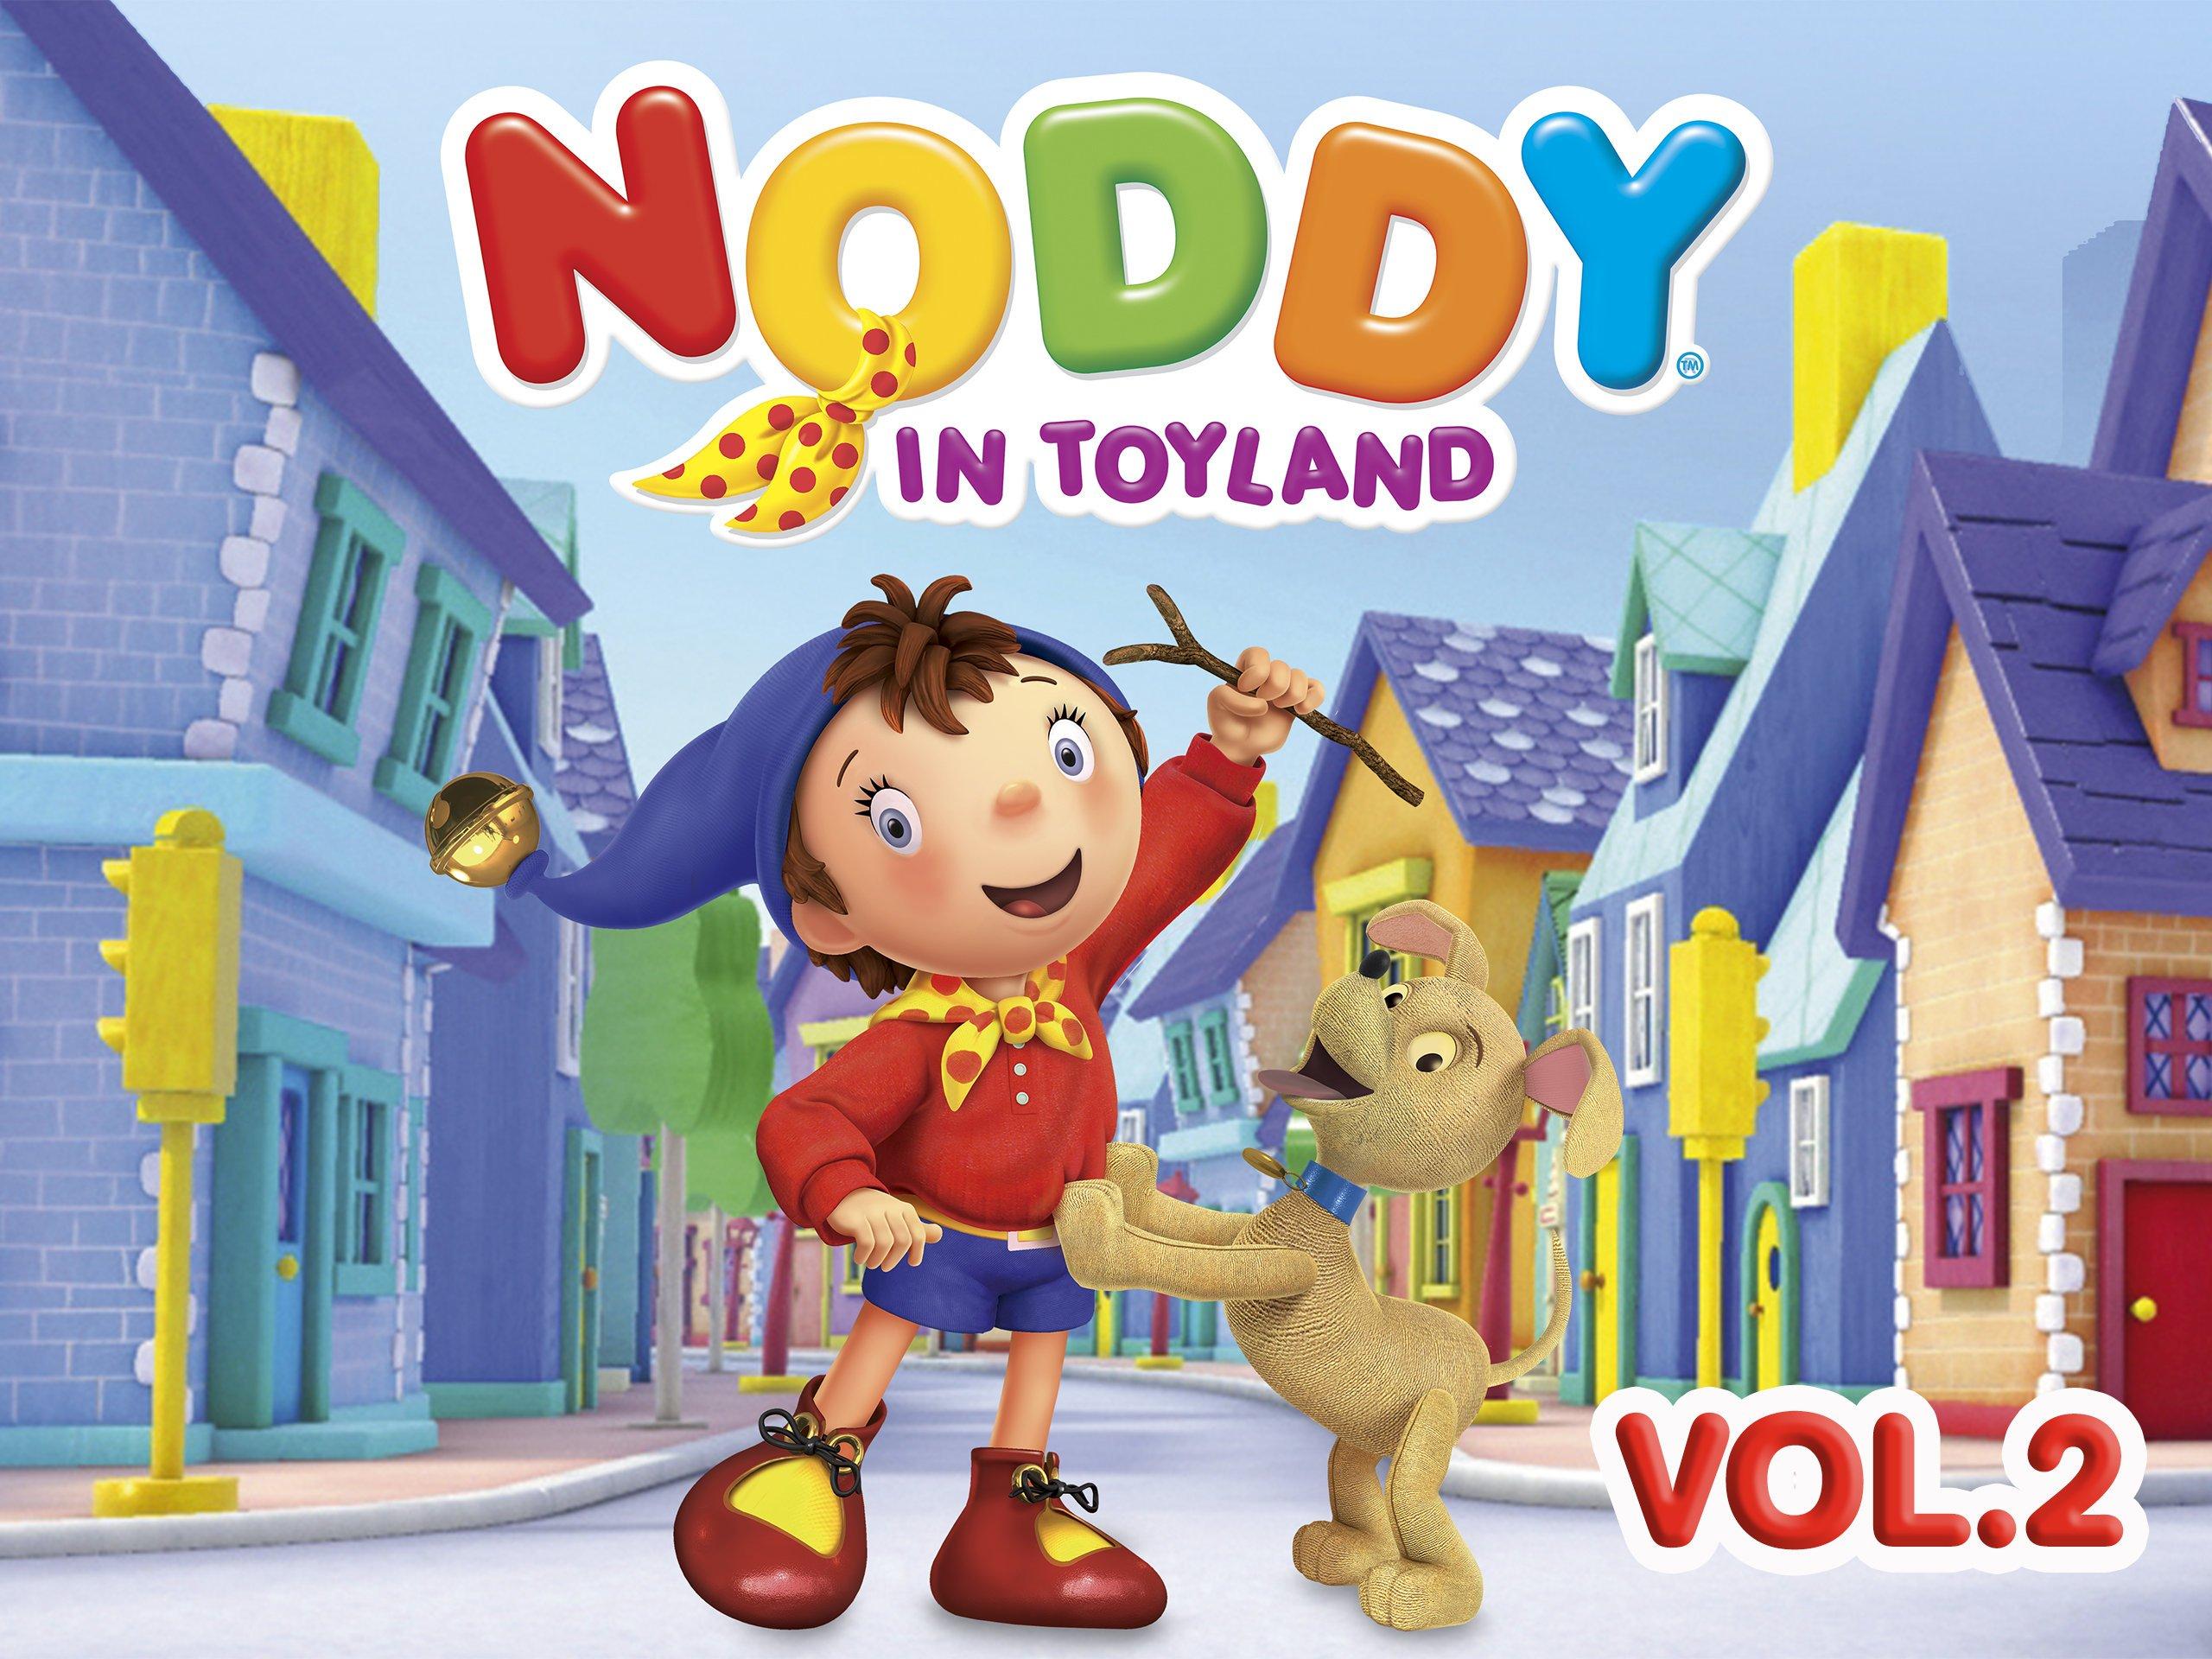 Amazon.com: Noddy In Toyland, Volume 2: Sophie Aldred, Teresa Gallagher, Bob Golding, Akiya Henry, David McCamley, Karen Ialacci, Gillian Higgins: Amazon ...